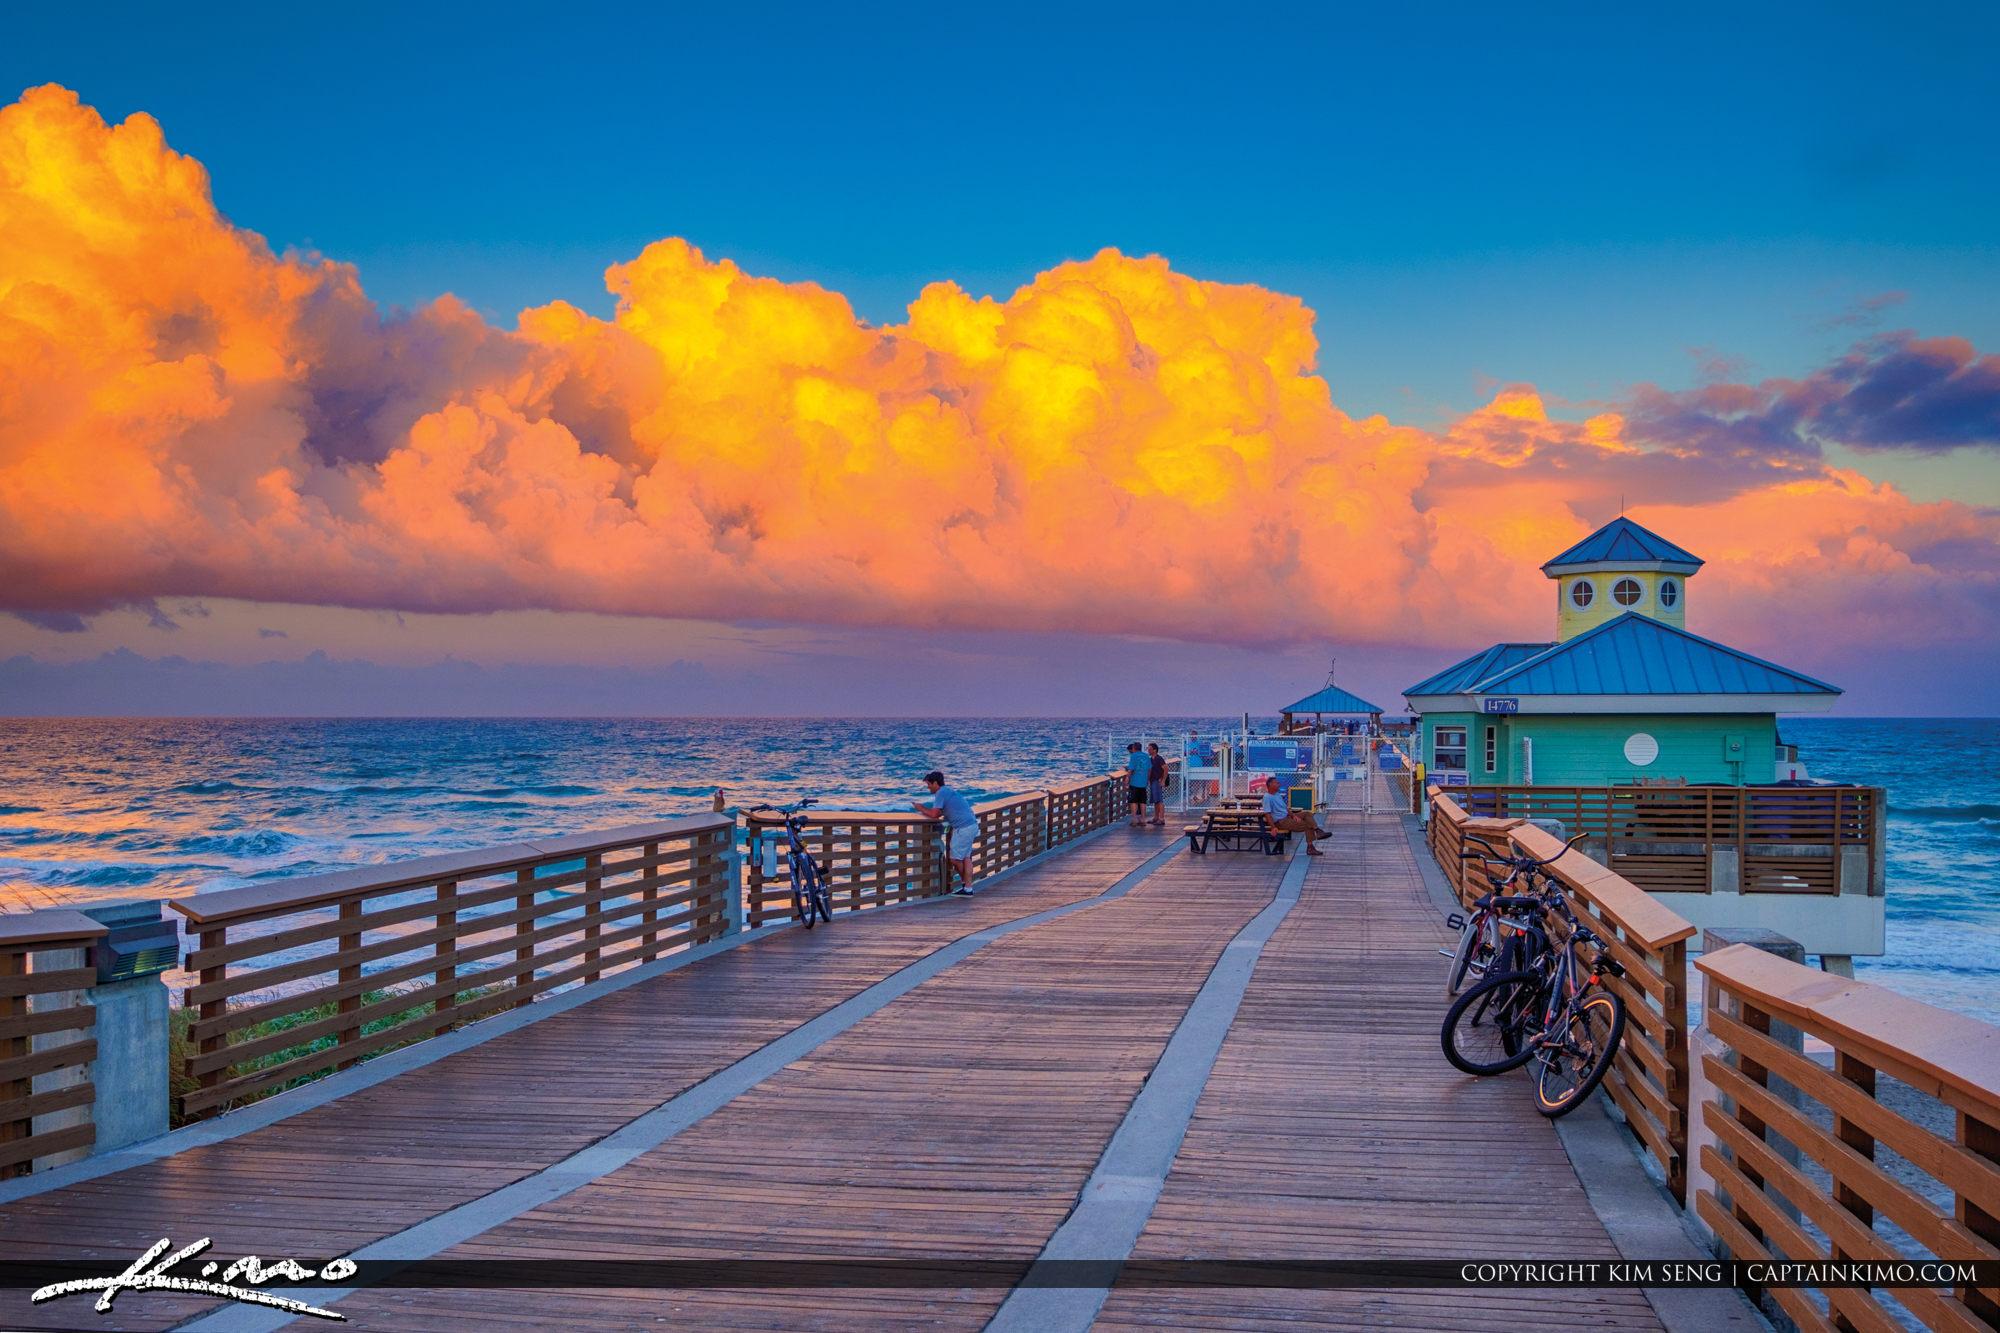 Juno Beach Pier Clouds Light Up at Sunset